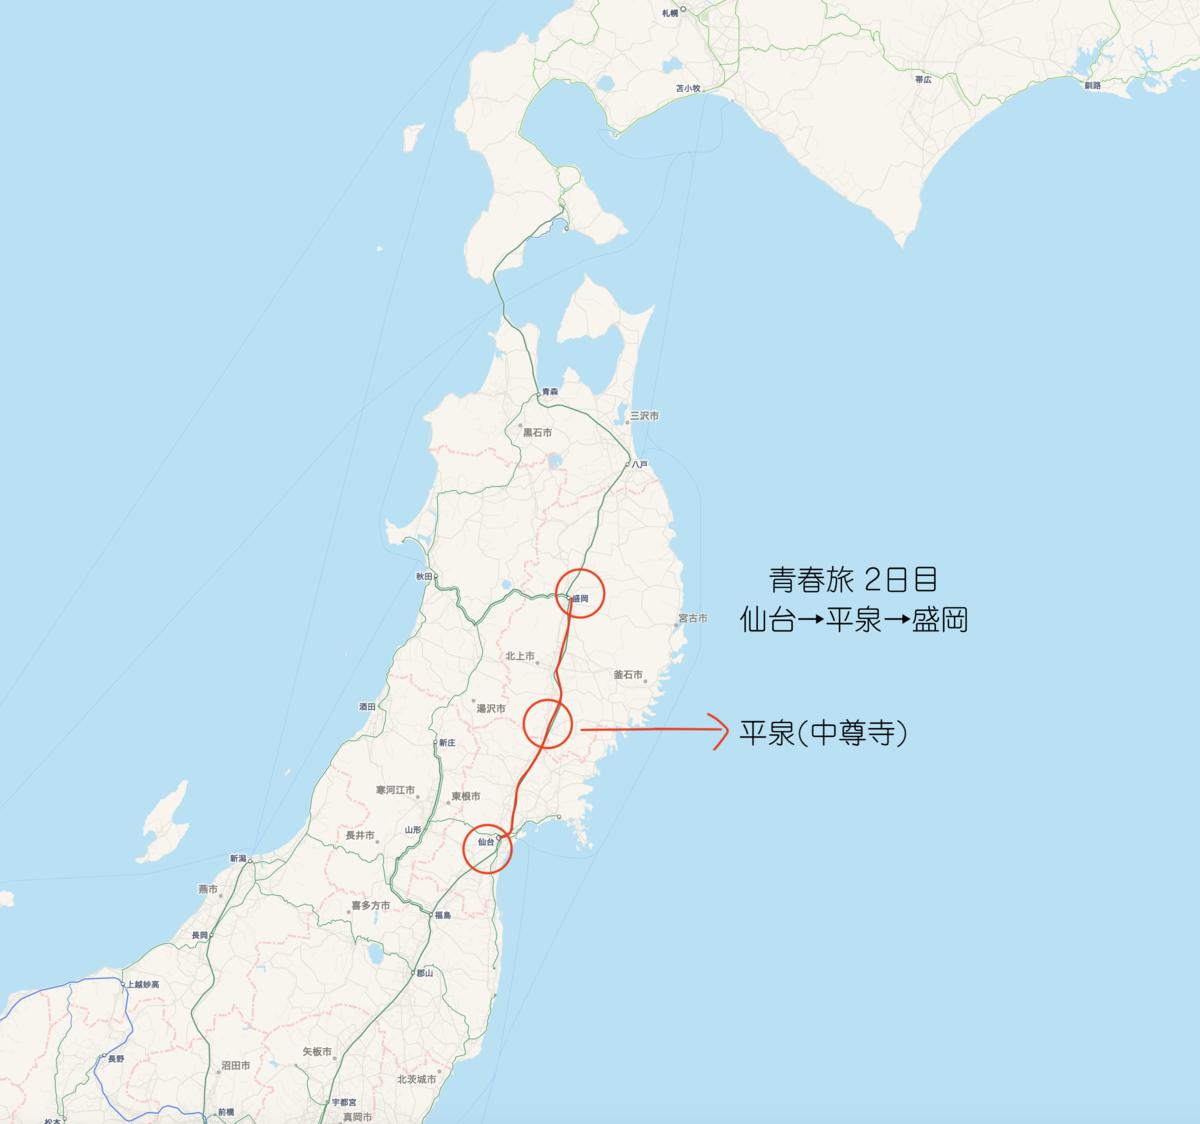 f:id:kootabi:20200204010513p:plain